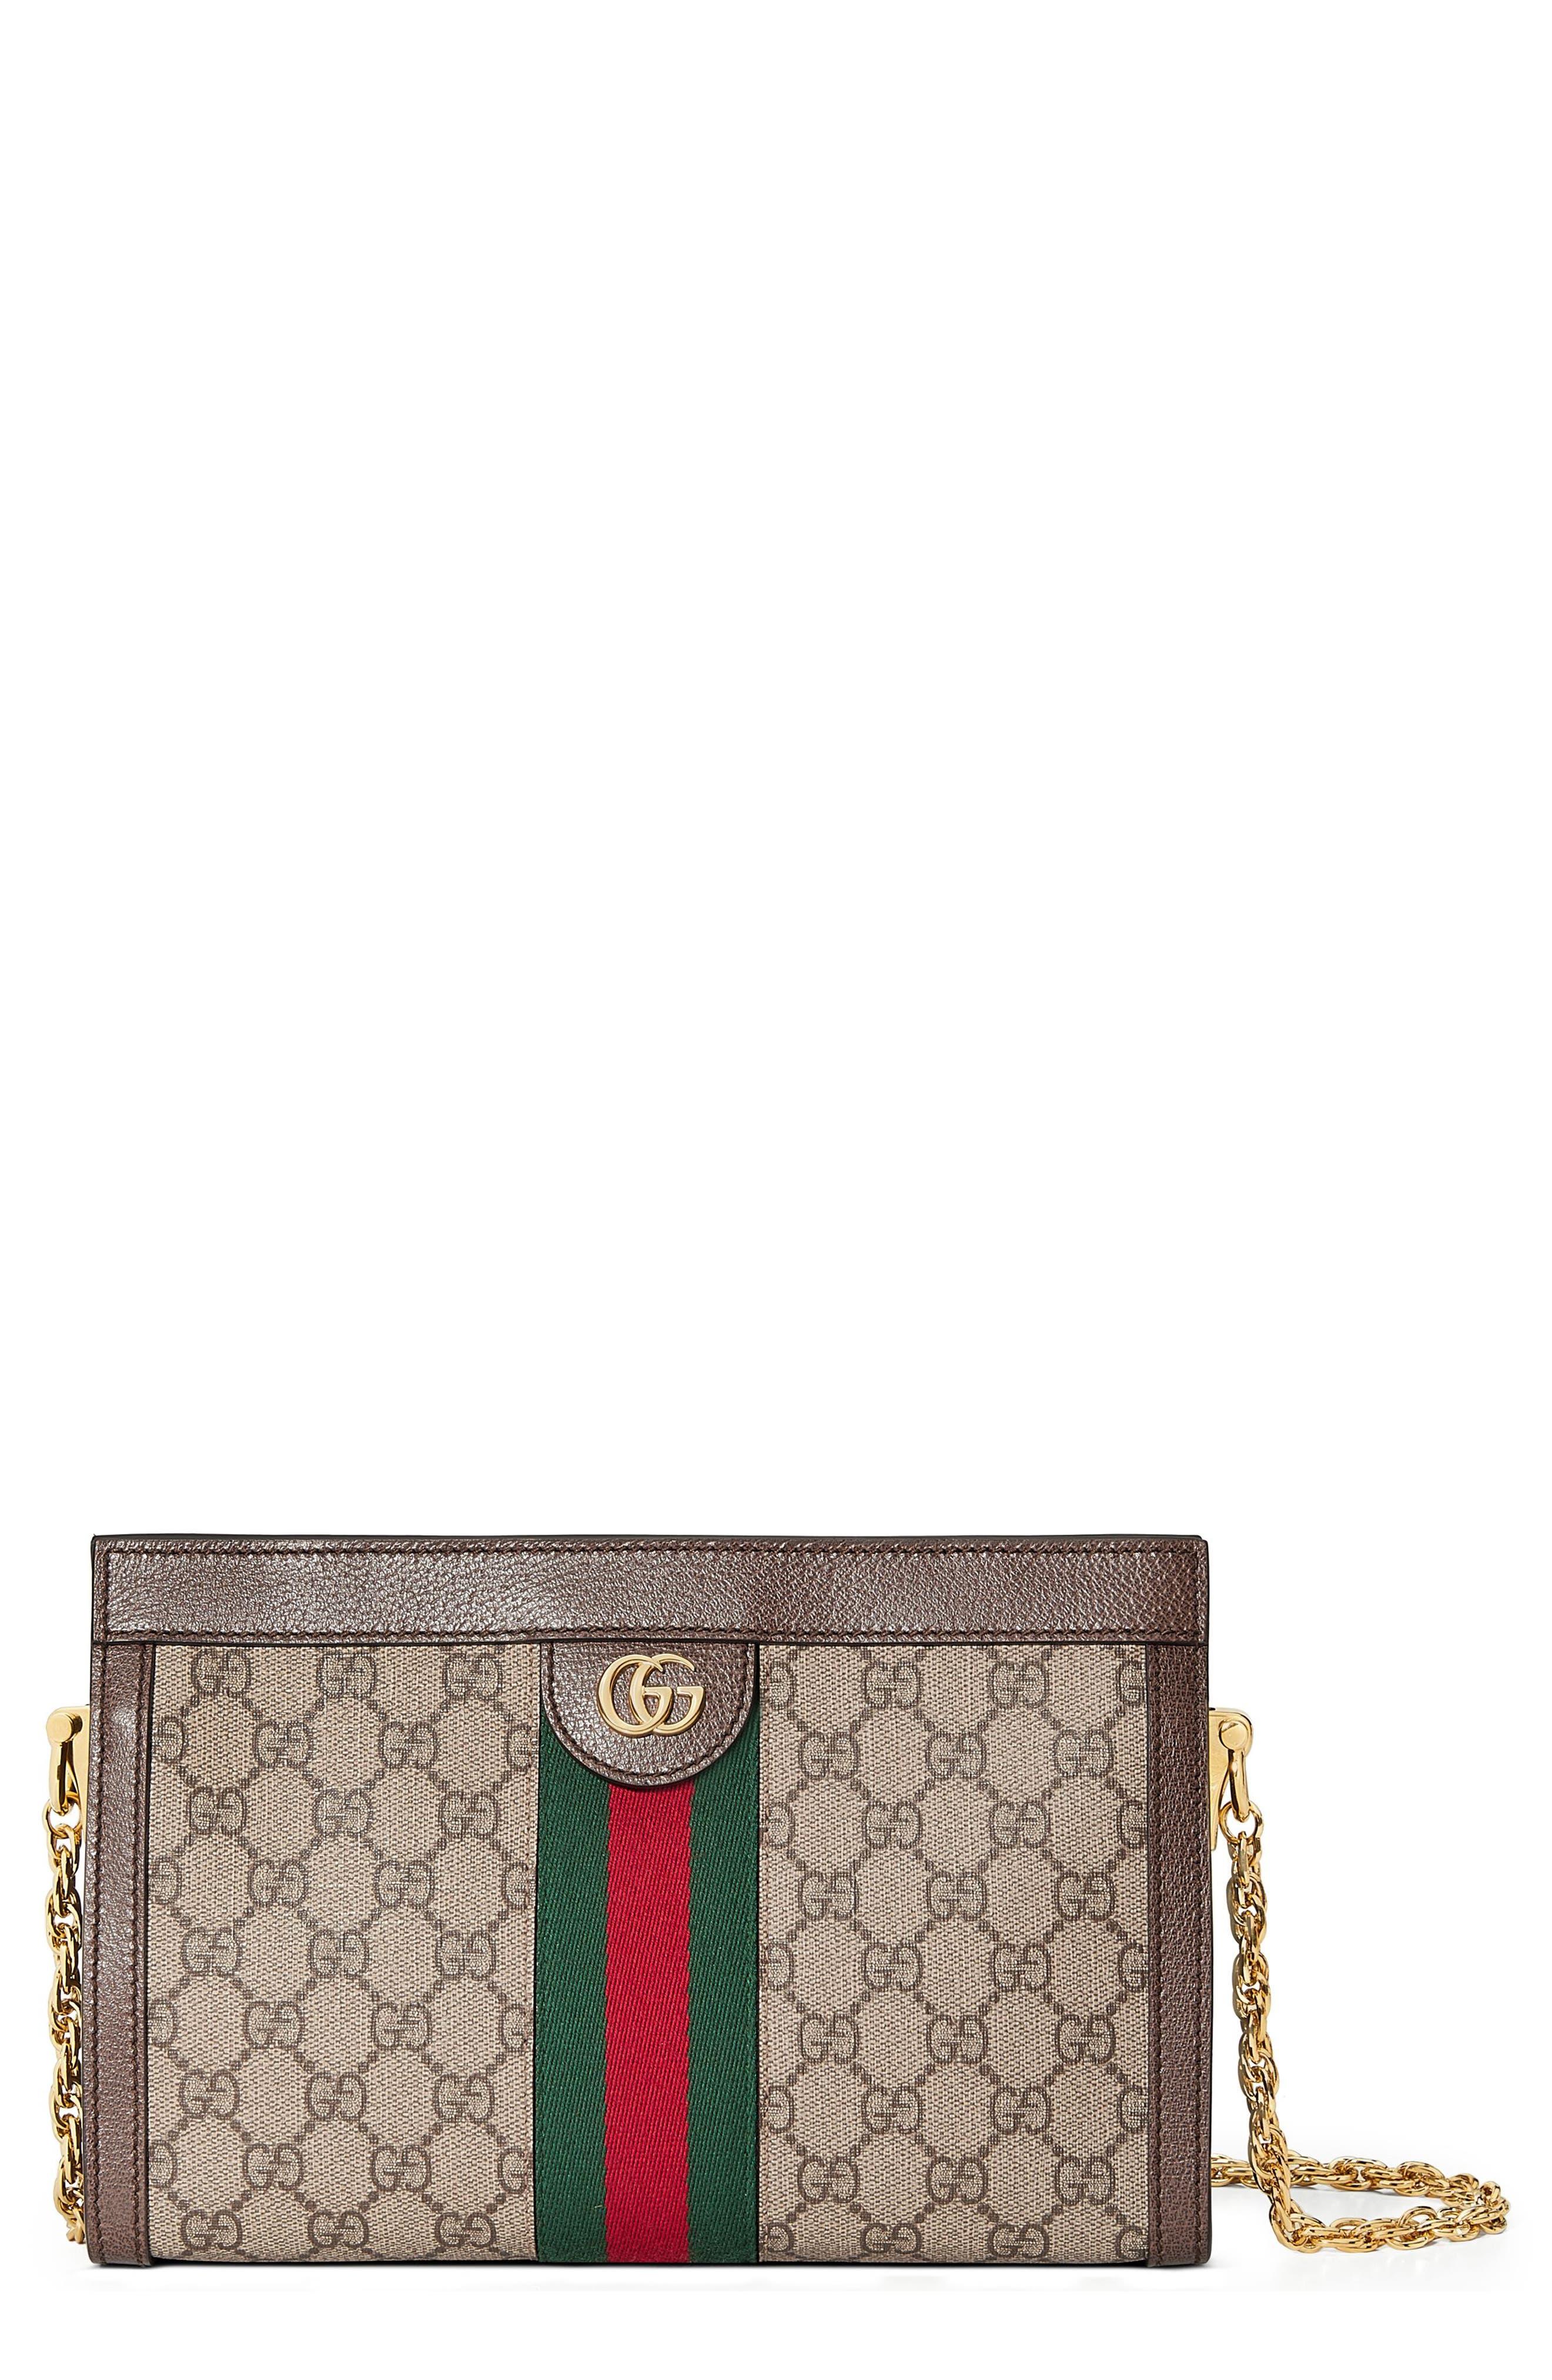 Gucci Small GG Supreme Shoulder Bag